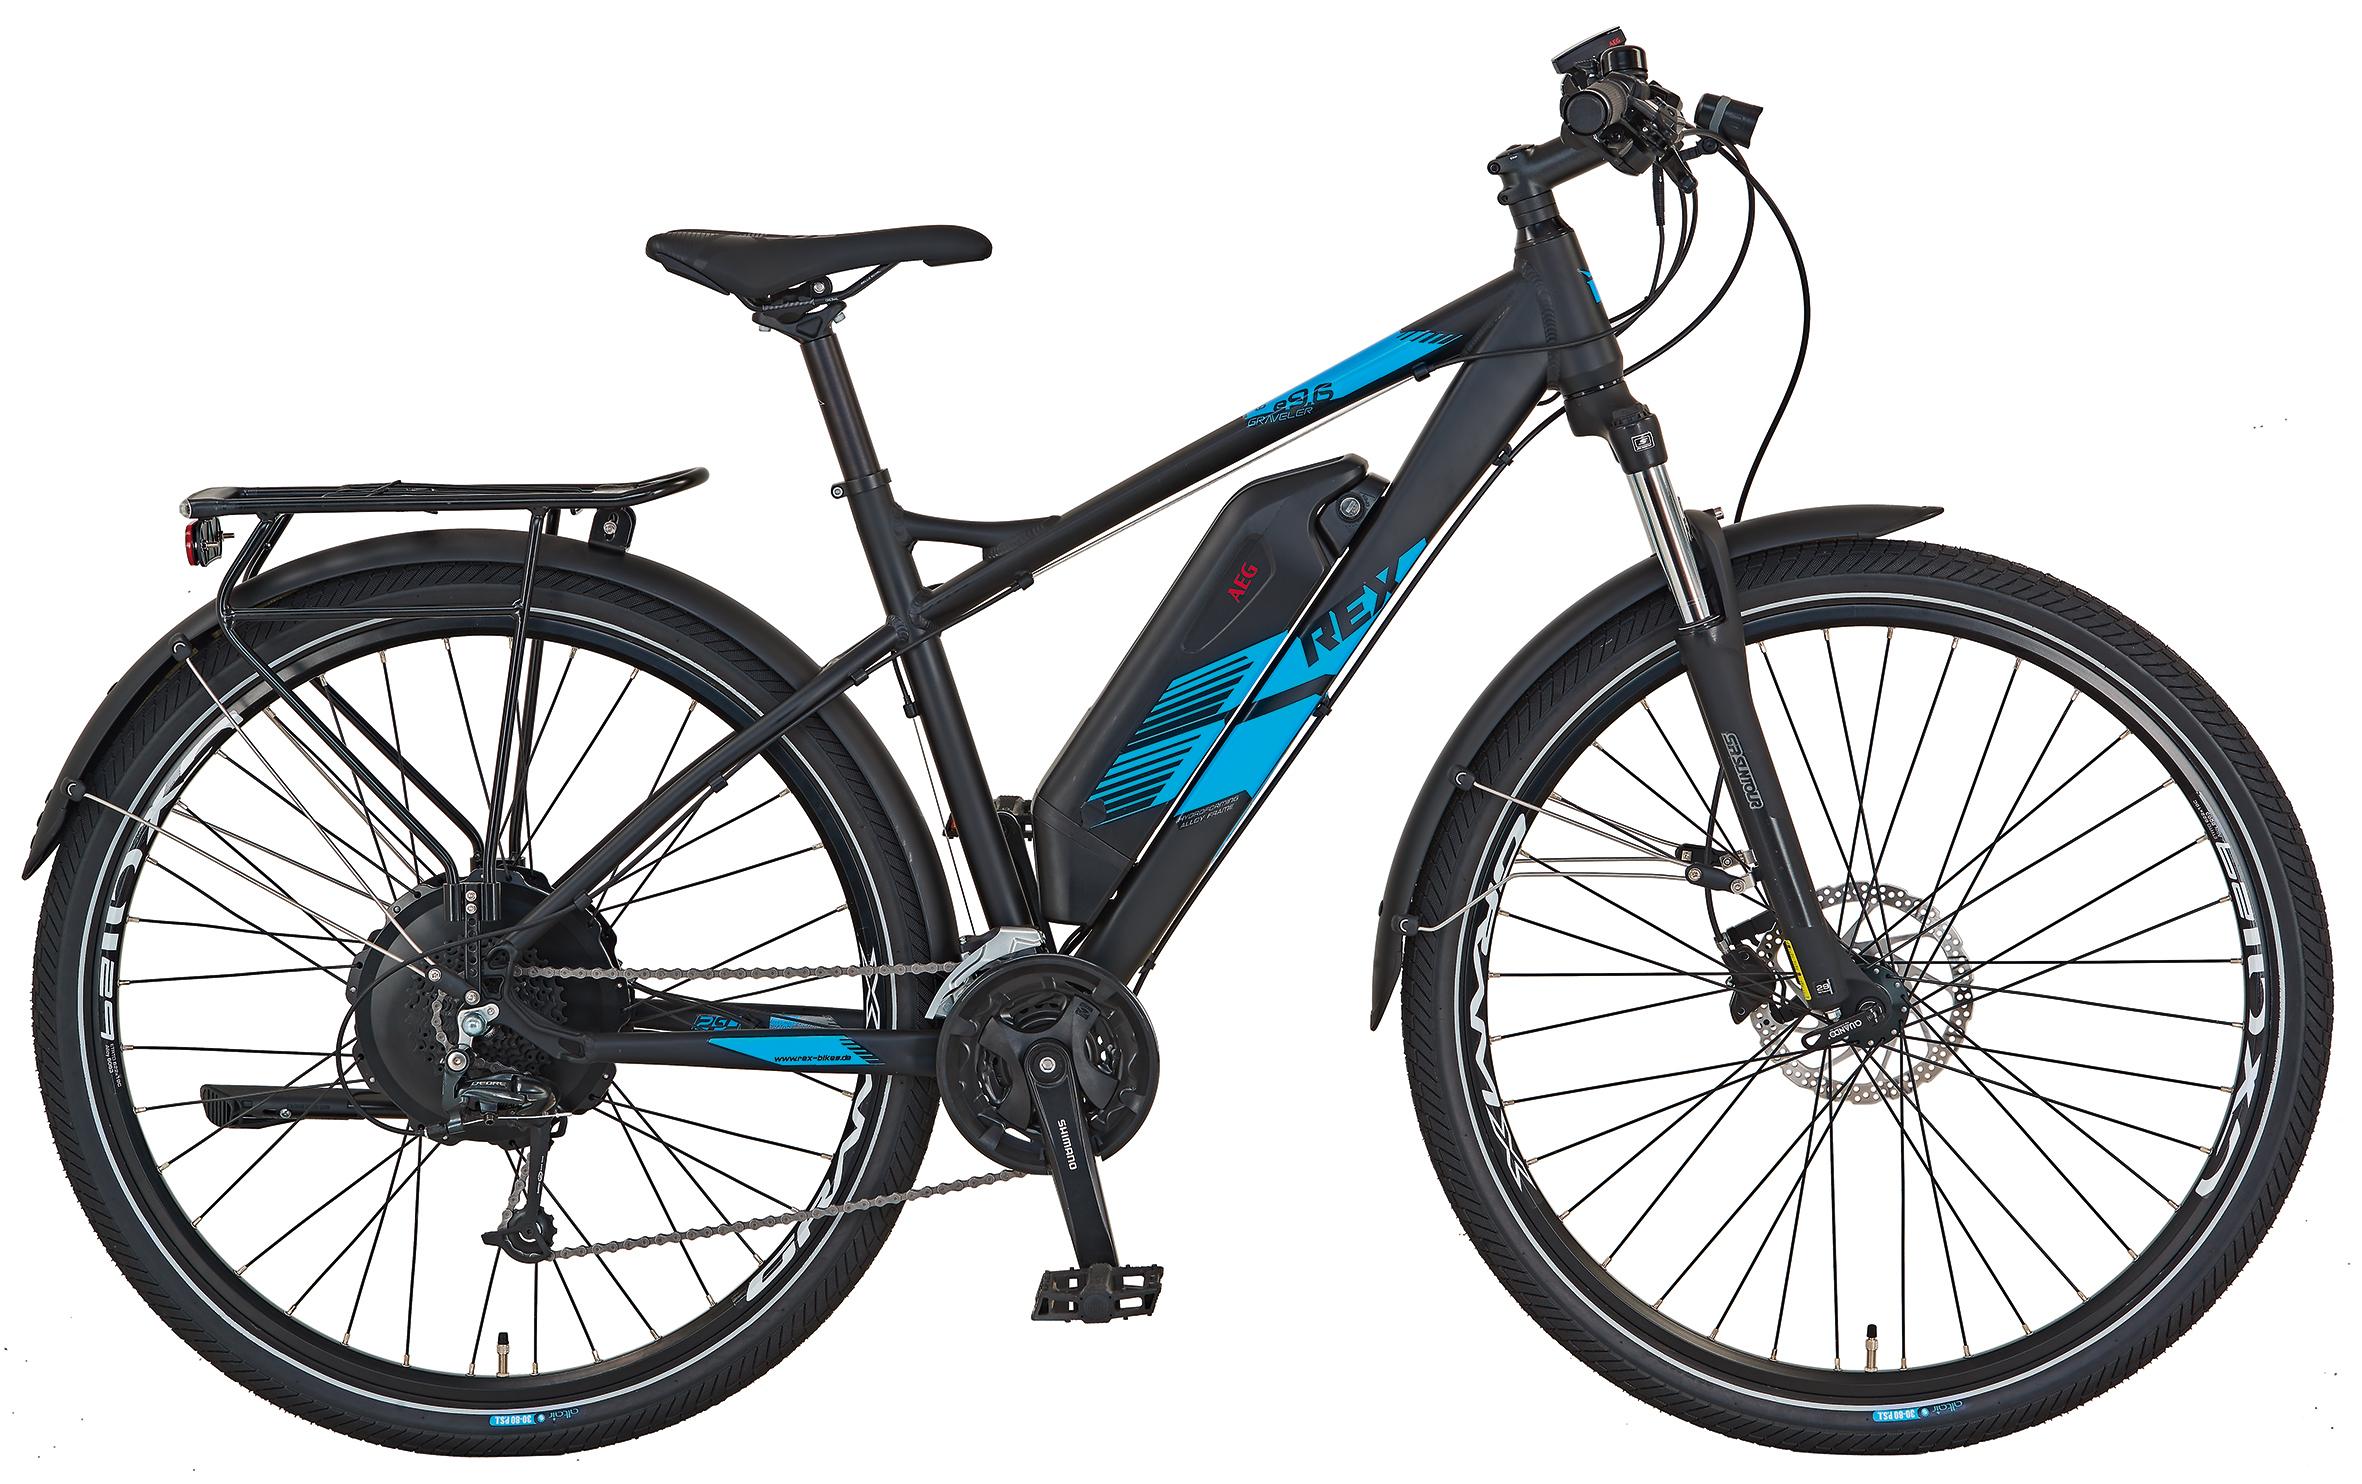 "Rex Bike Elektrofahrrad / E-All Terrain Bike Graveler e9.6 E-ATB 29"" Bild 1"